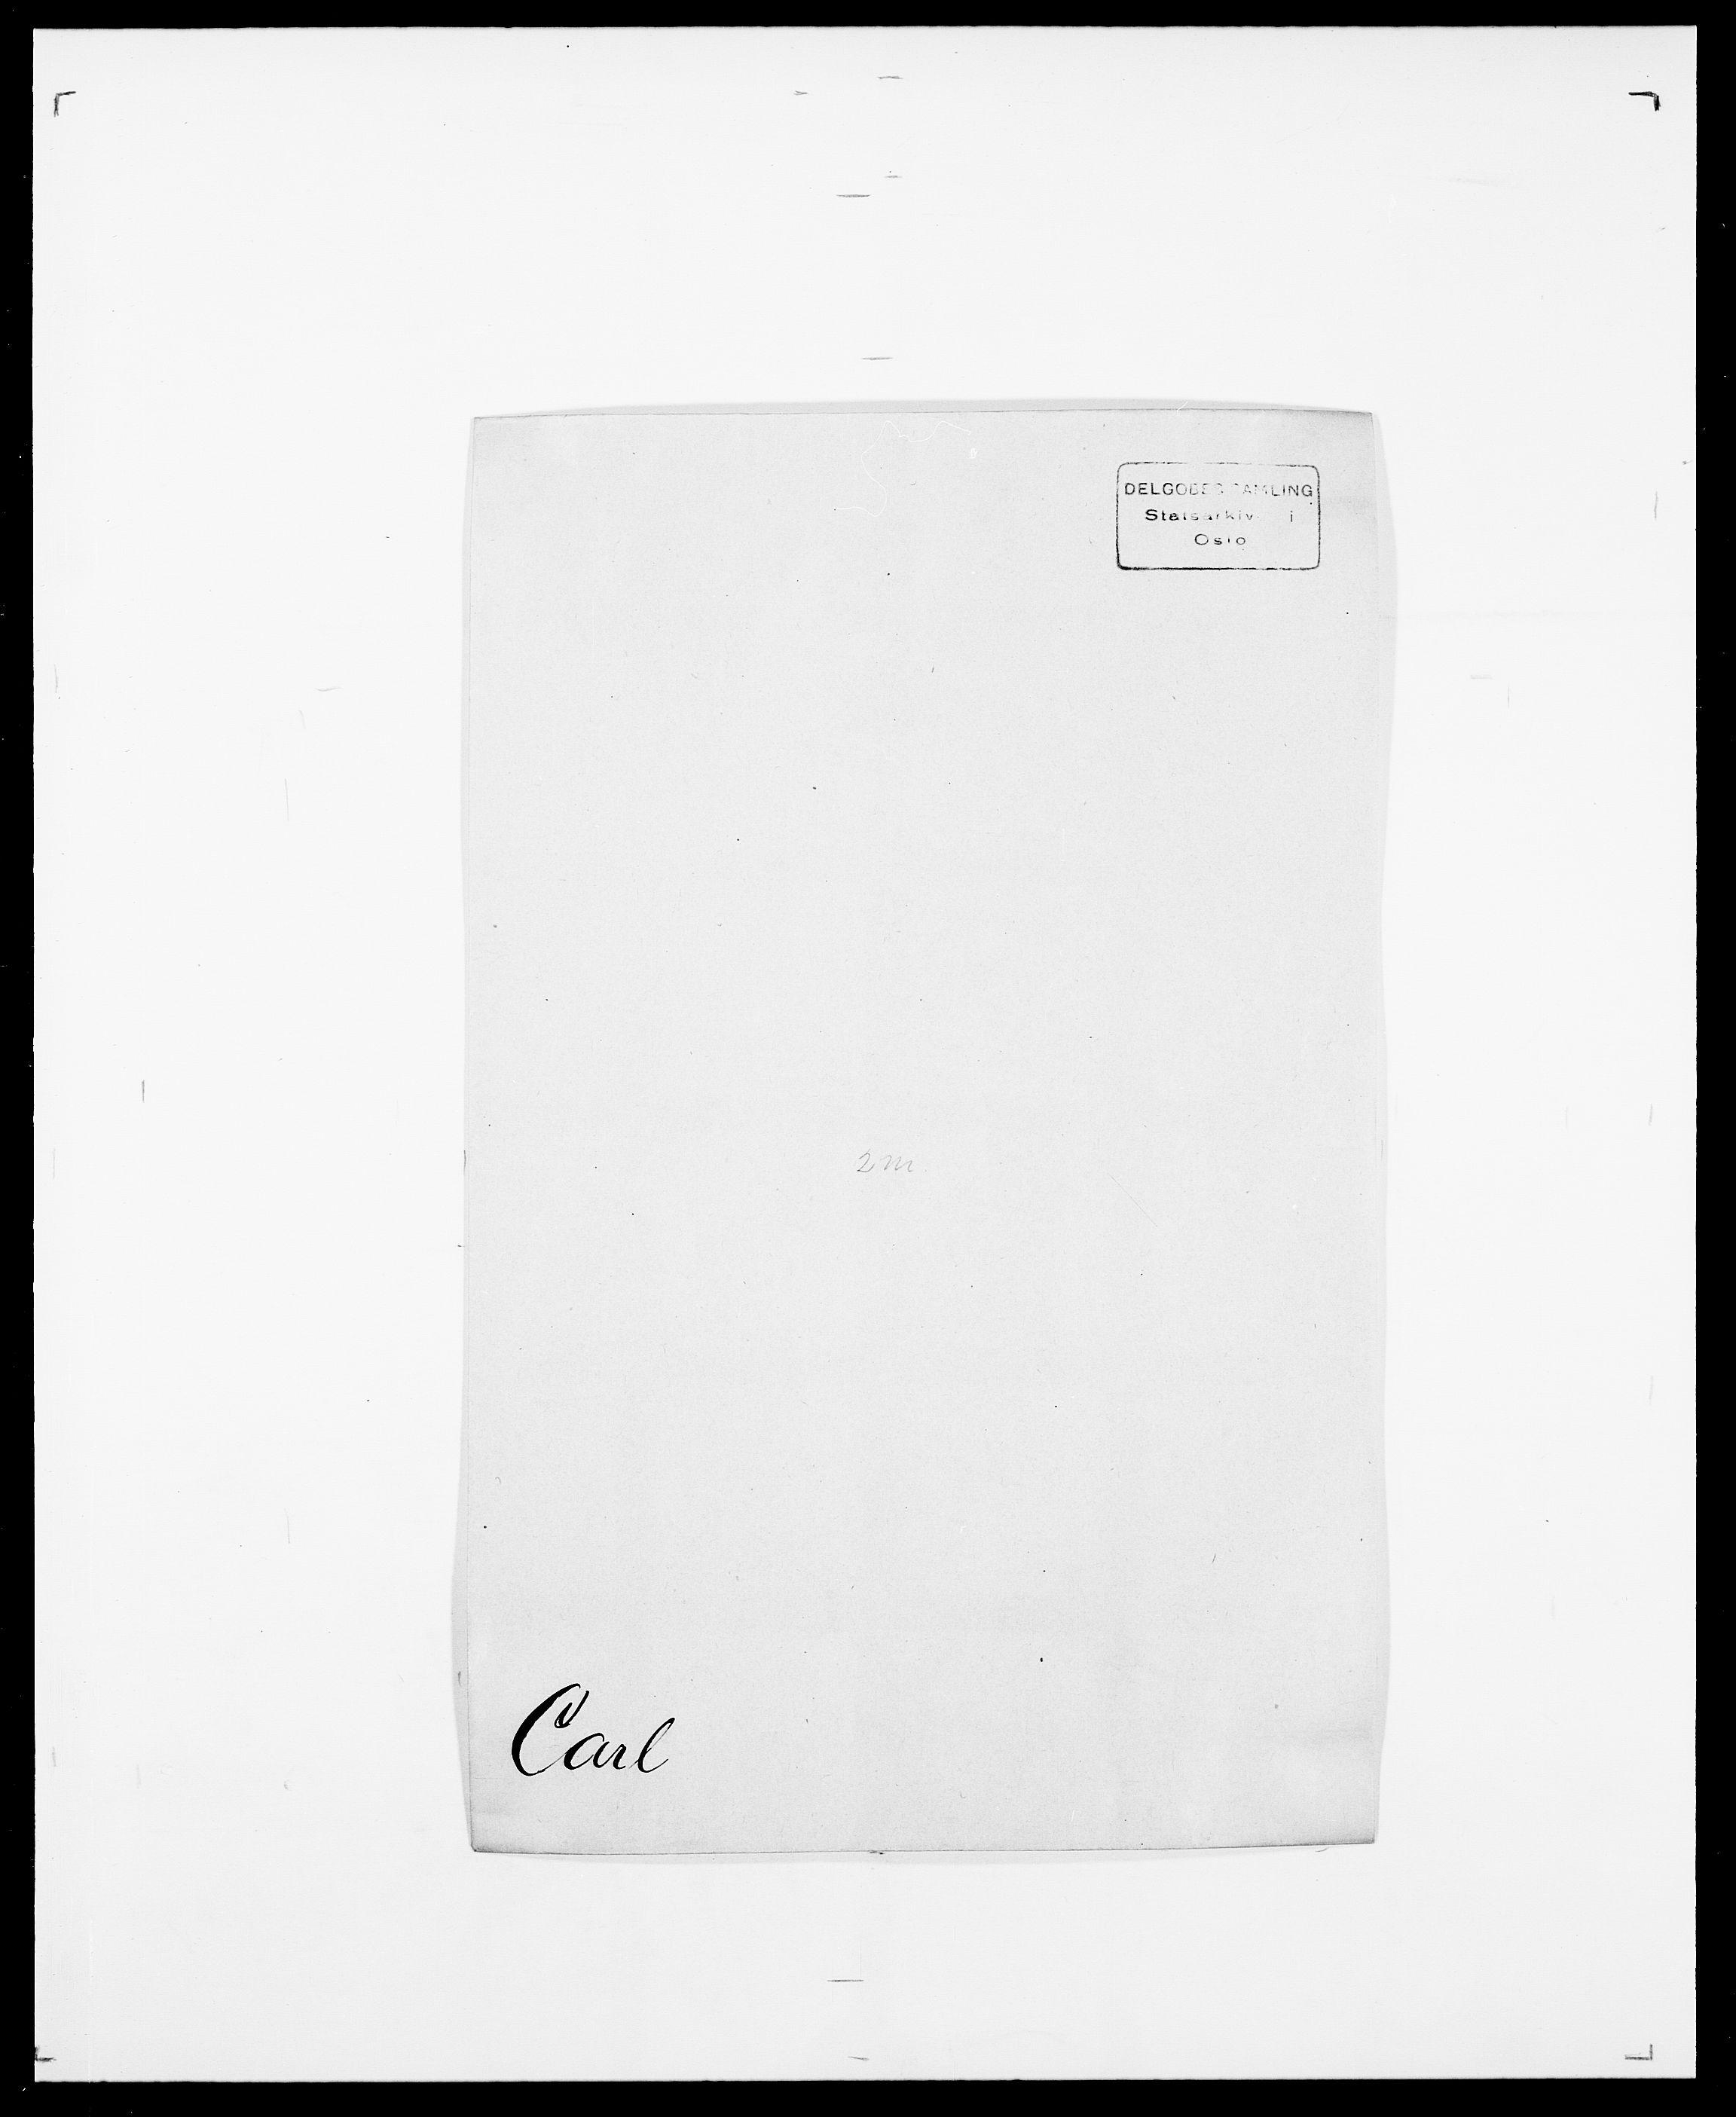 SAO, Delgobe, Charles Antoine - samling, D/Da/L0008: Capjon - Dagenbolt, s. 40